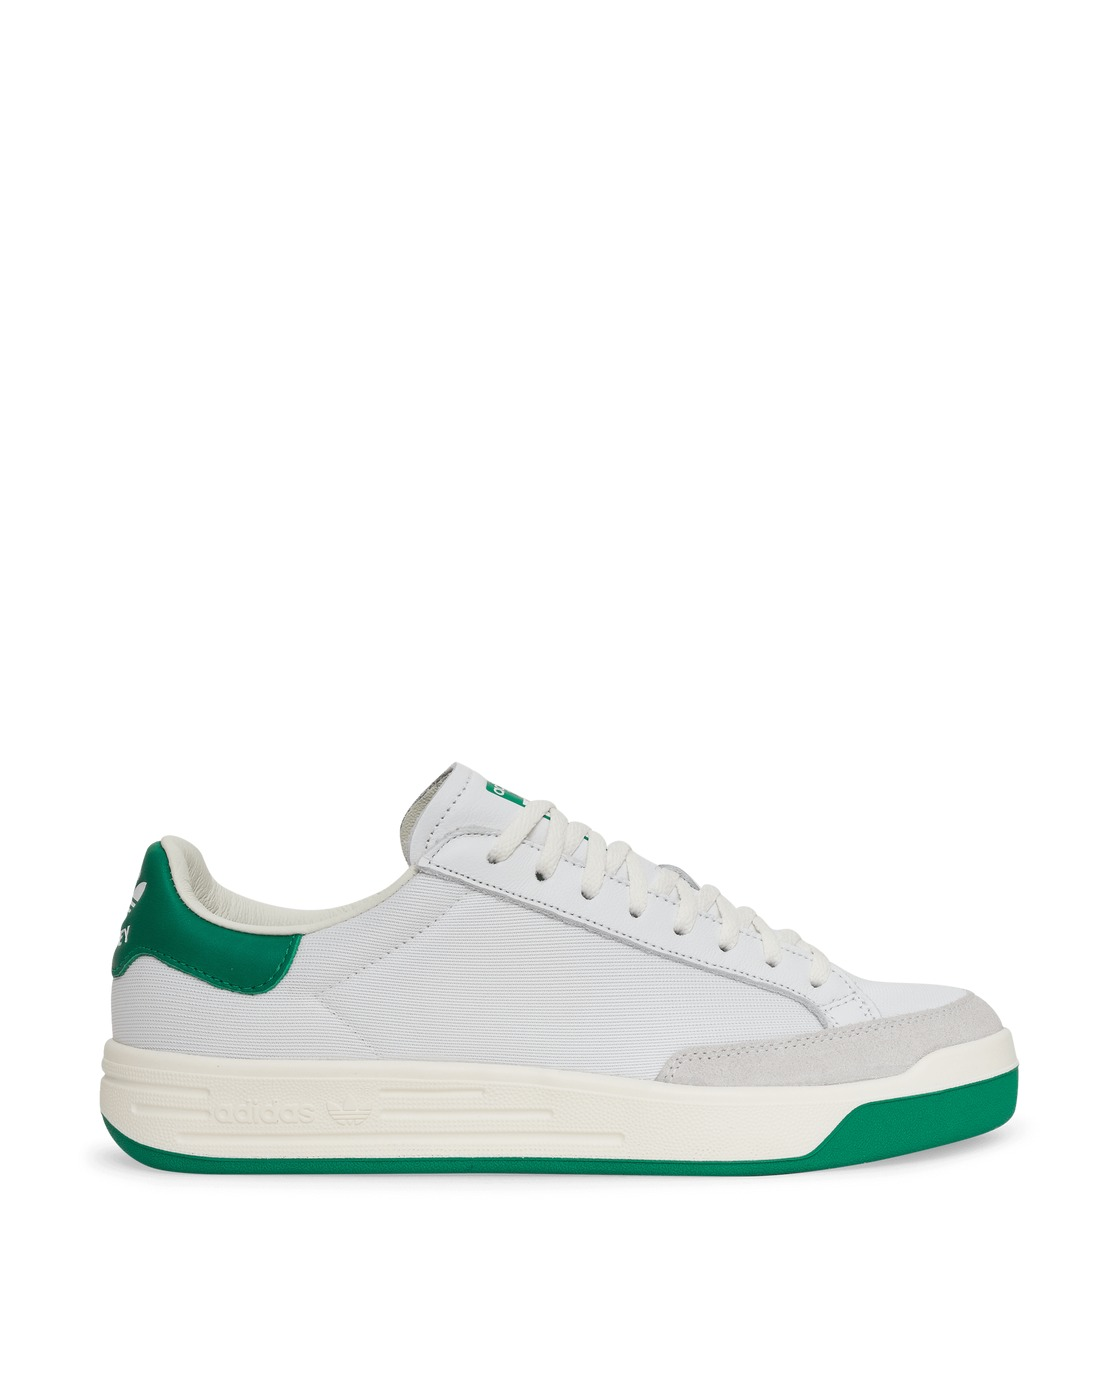 Photo: Adidas Originals Rod Laver Sneakers Ftwr White/Green 41